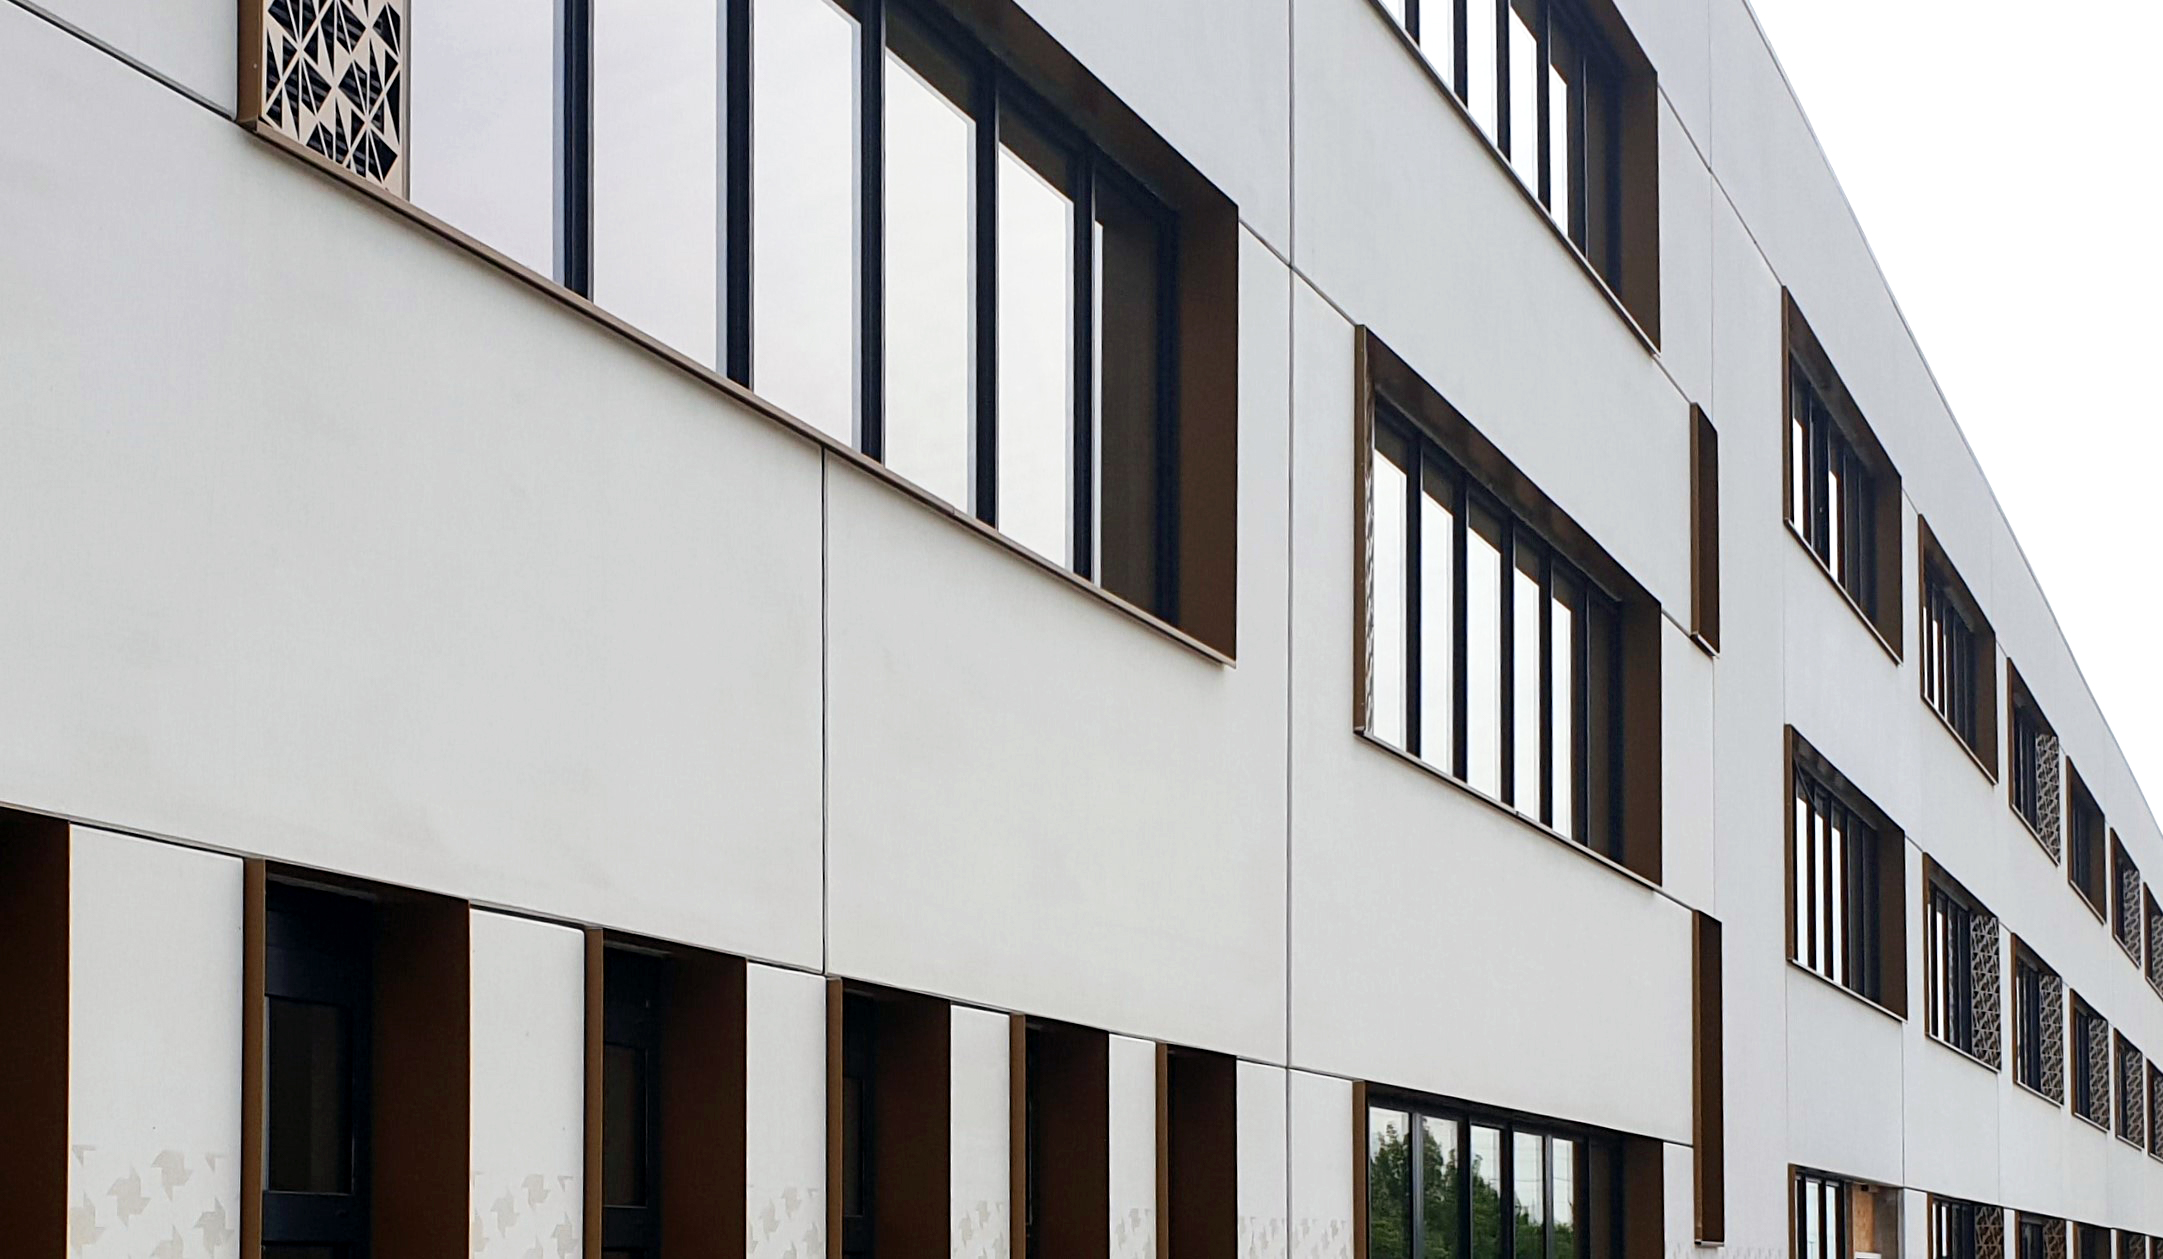 façade du collège André Tiraqueau de Fontenay-le-Comte